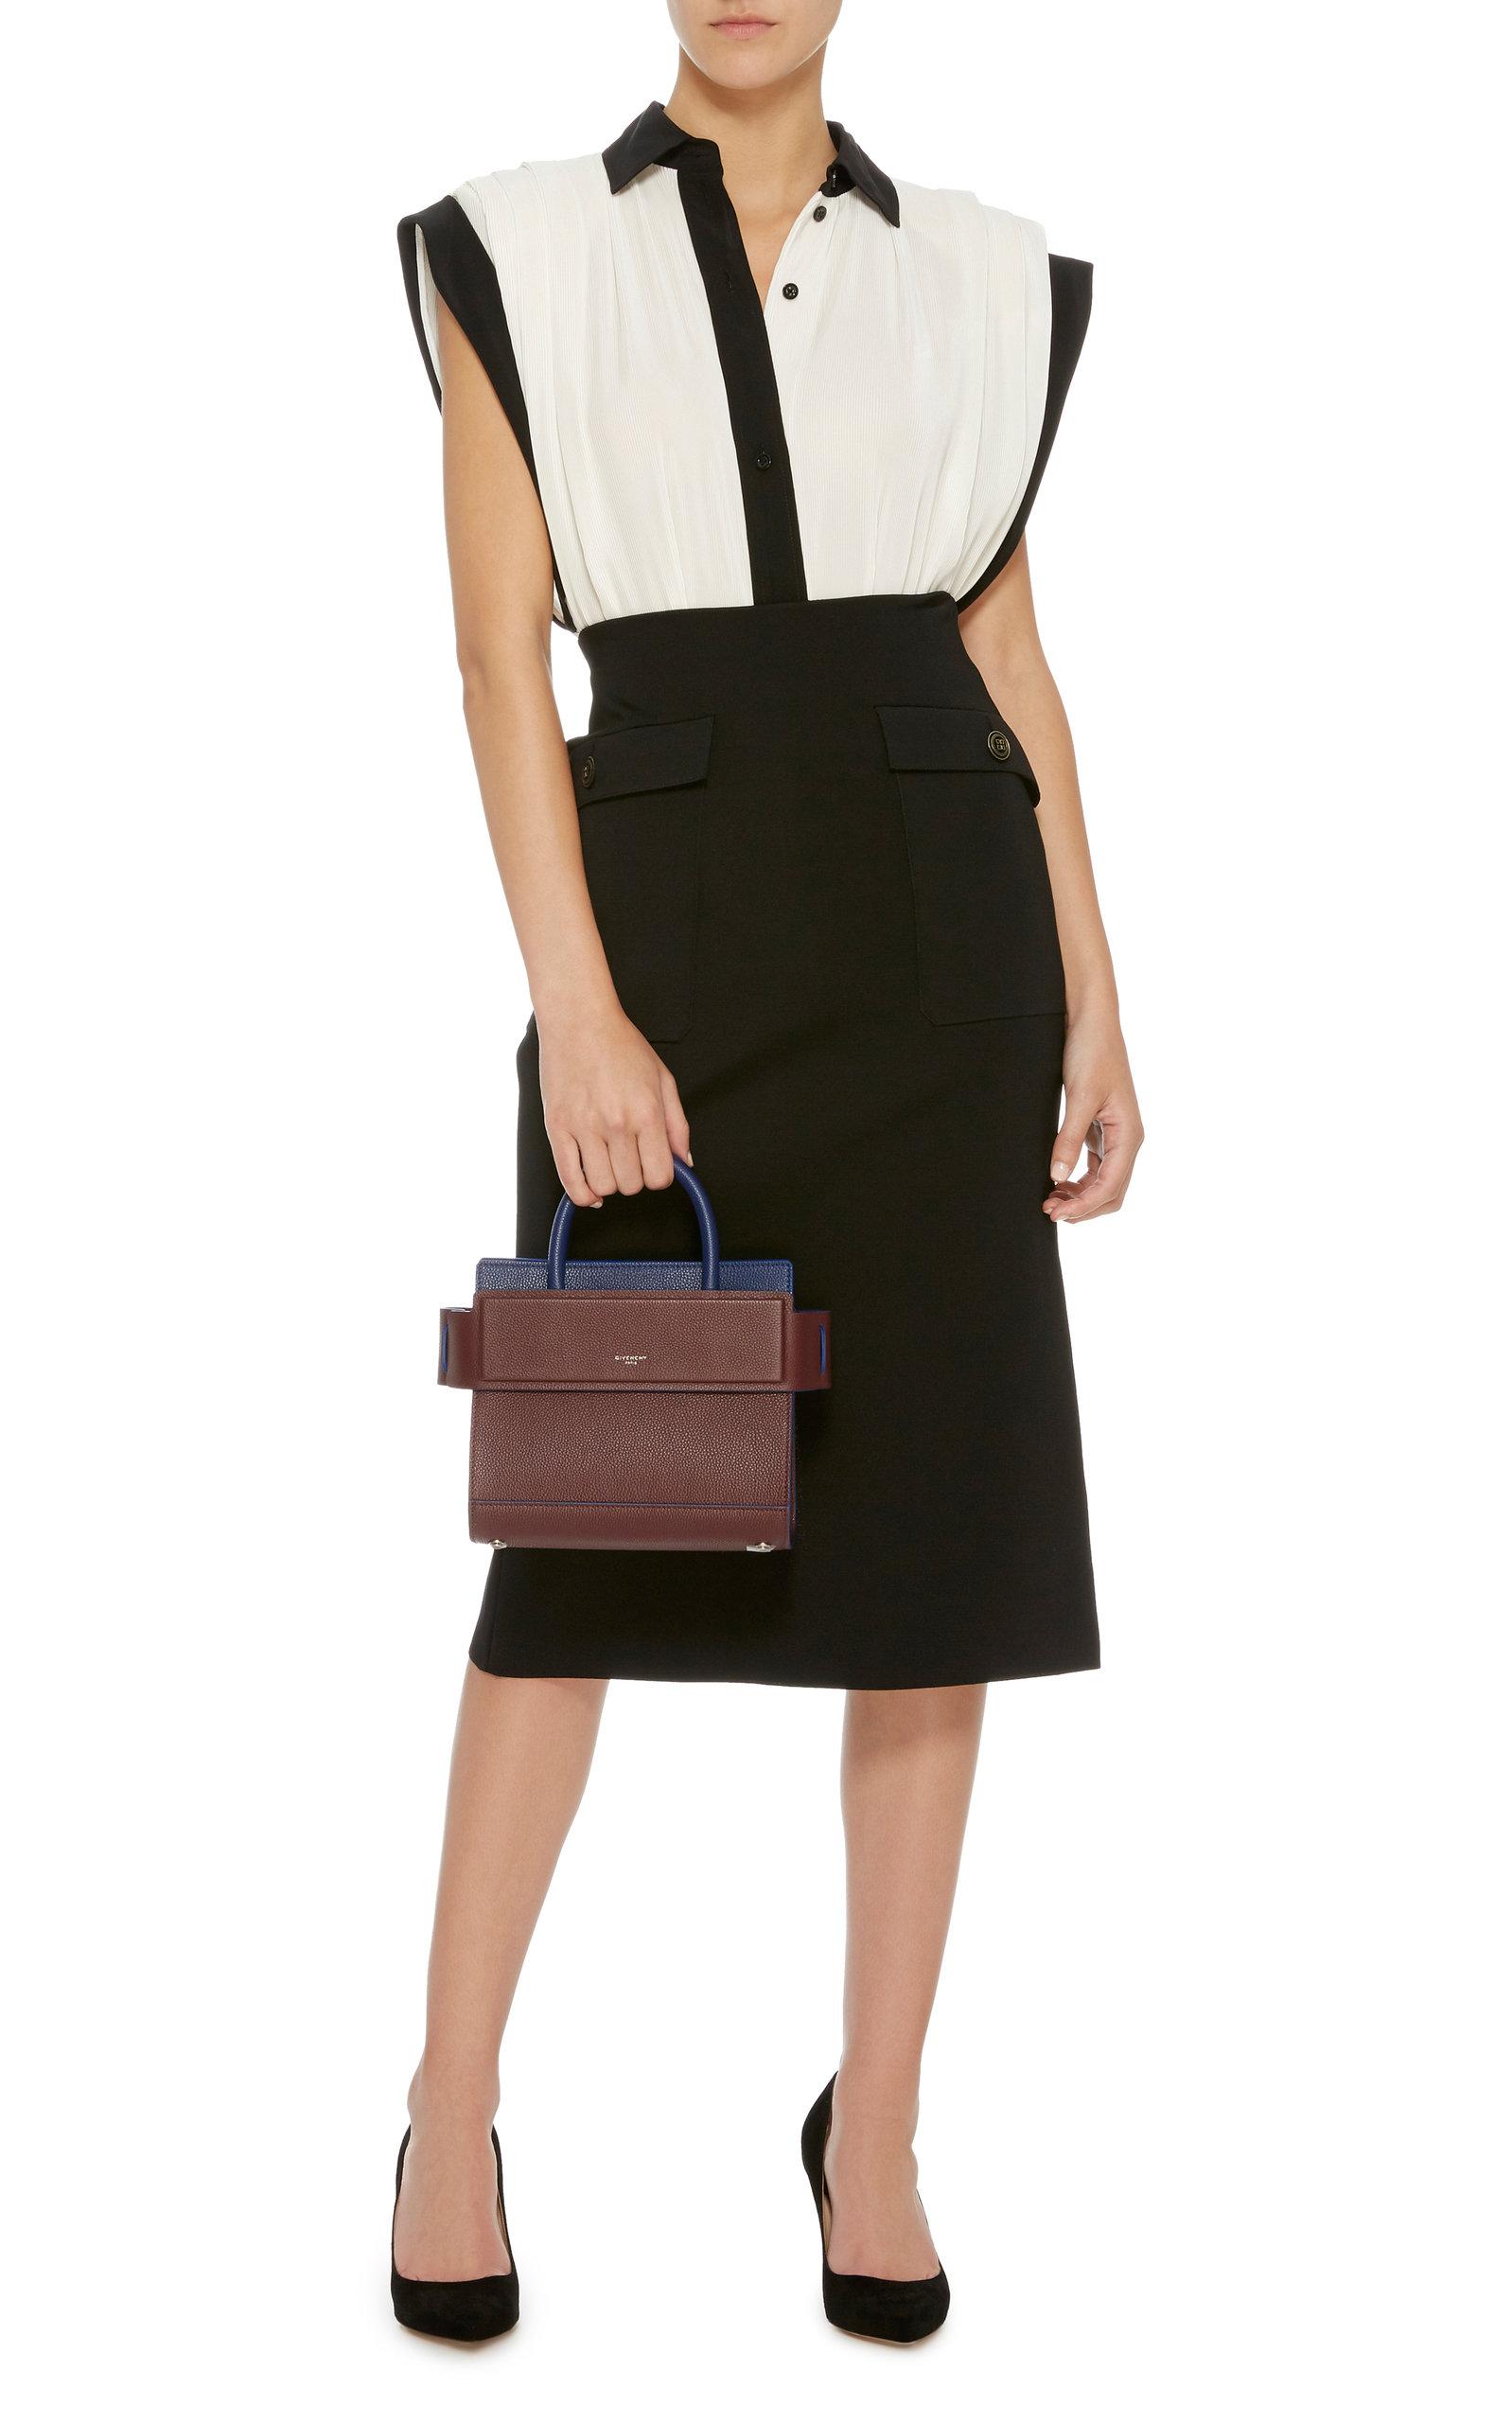 0000c02b1d GivenchyHorizon Color-Block Leather Mini Bag. CLOSE. Loading